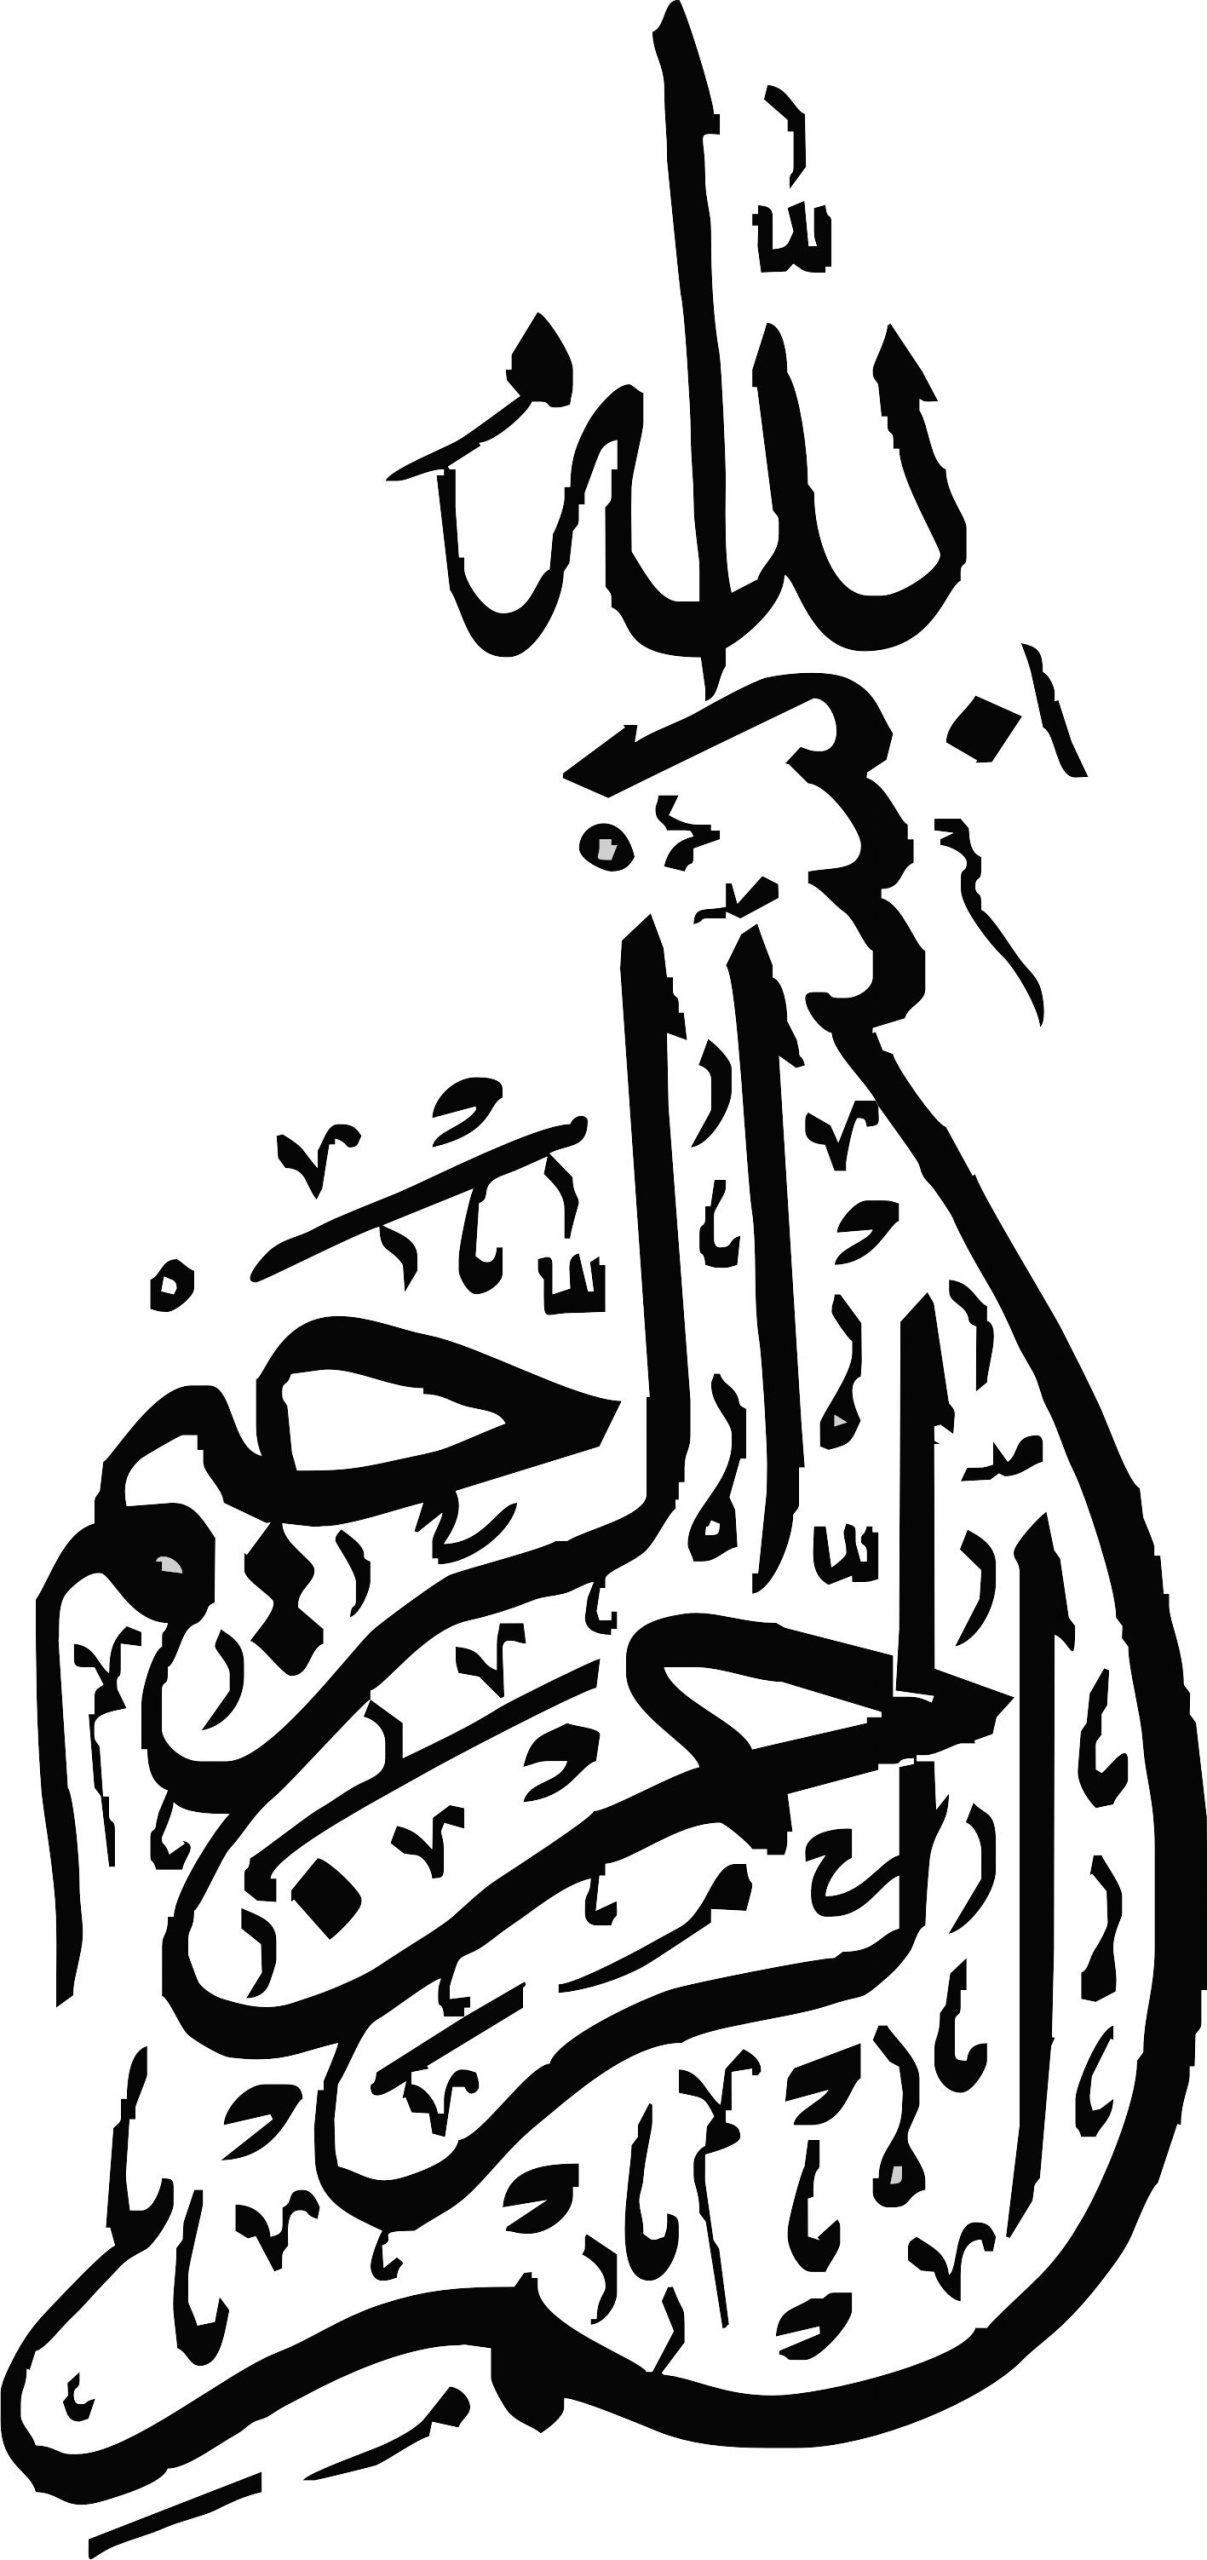 07 scaled - طرح های  بسم الله الرحمن الرحیم برای مقاله و پایان نامه